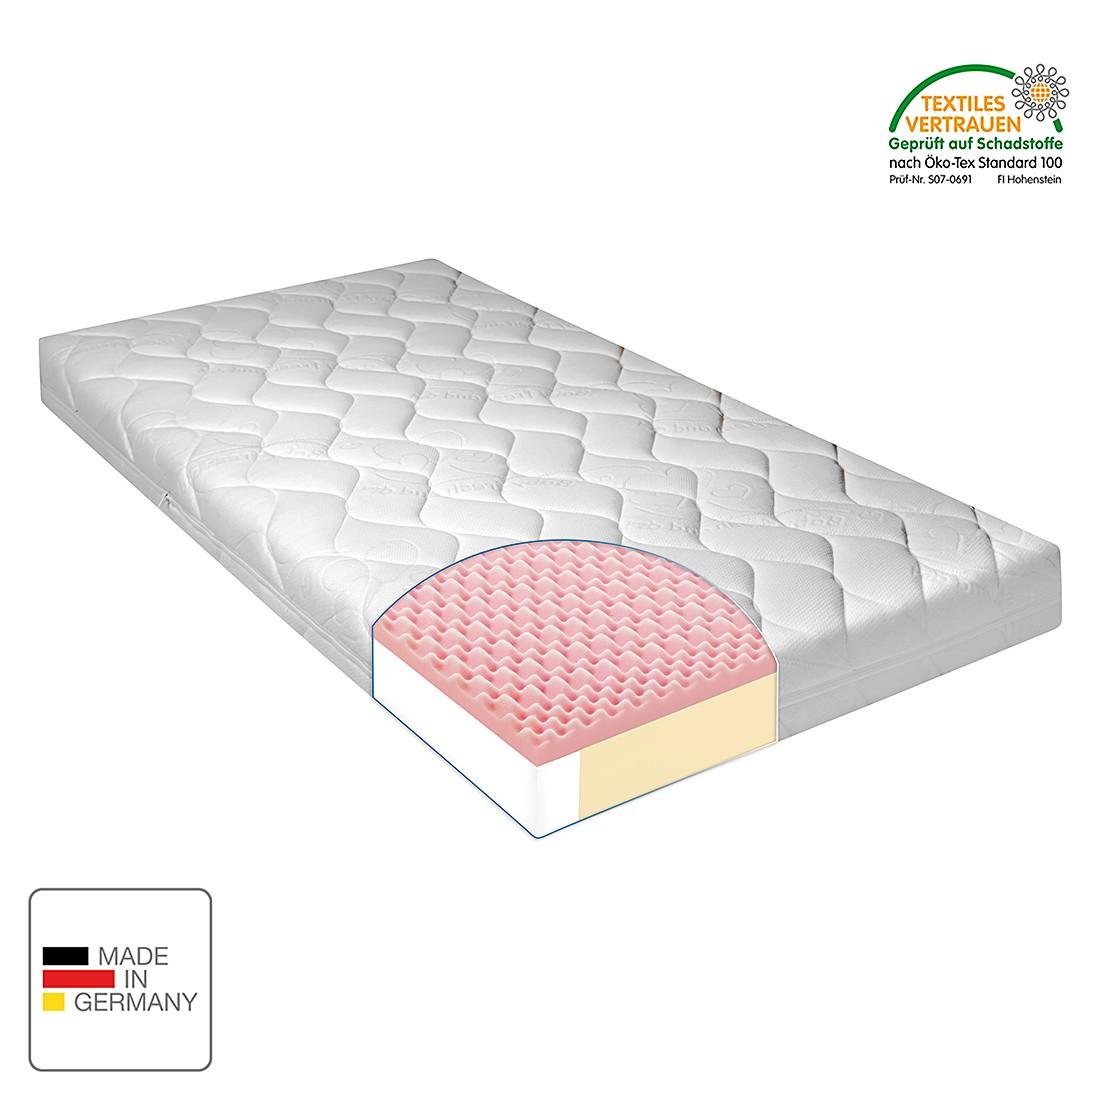 babymatratze air wave liegefl che 70 x 140 cm julius. Black Bedroom Furniture Sets. Home Design Ideas